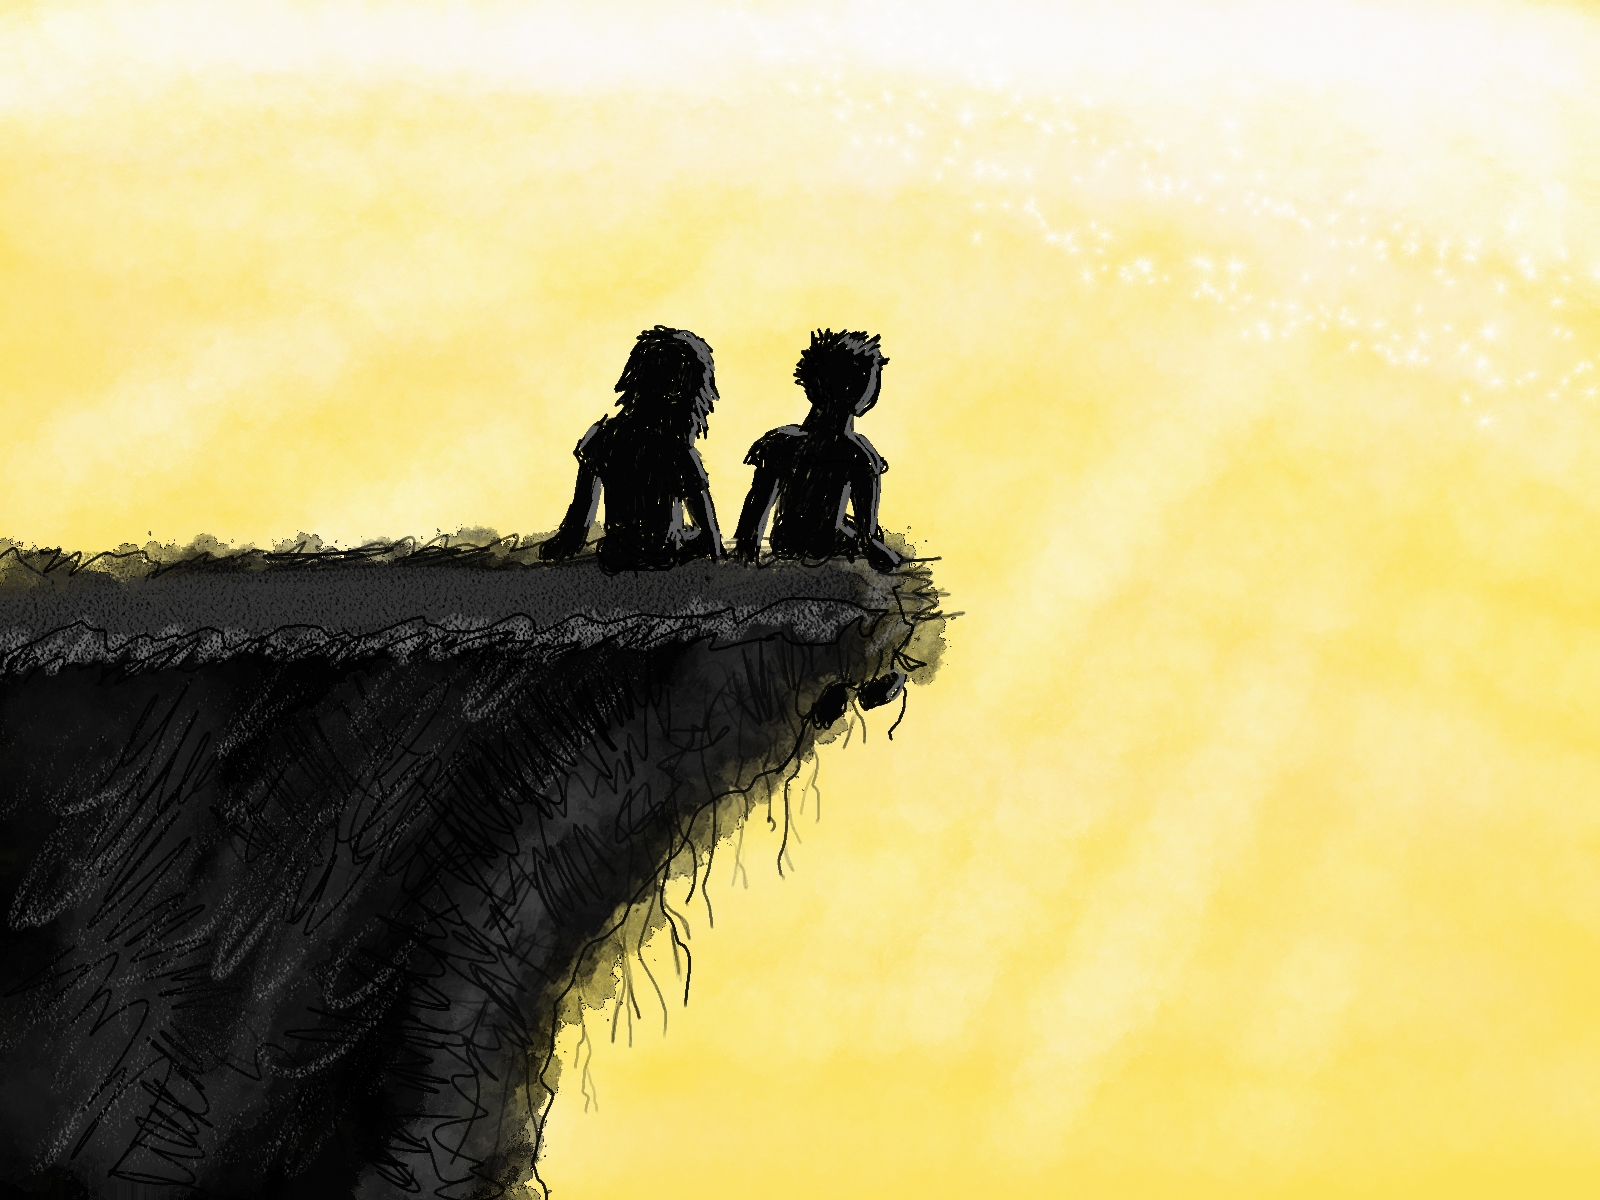 Edge of the golden sun